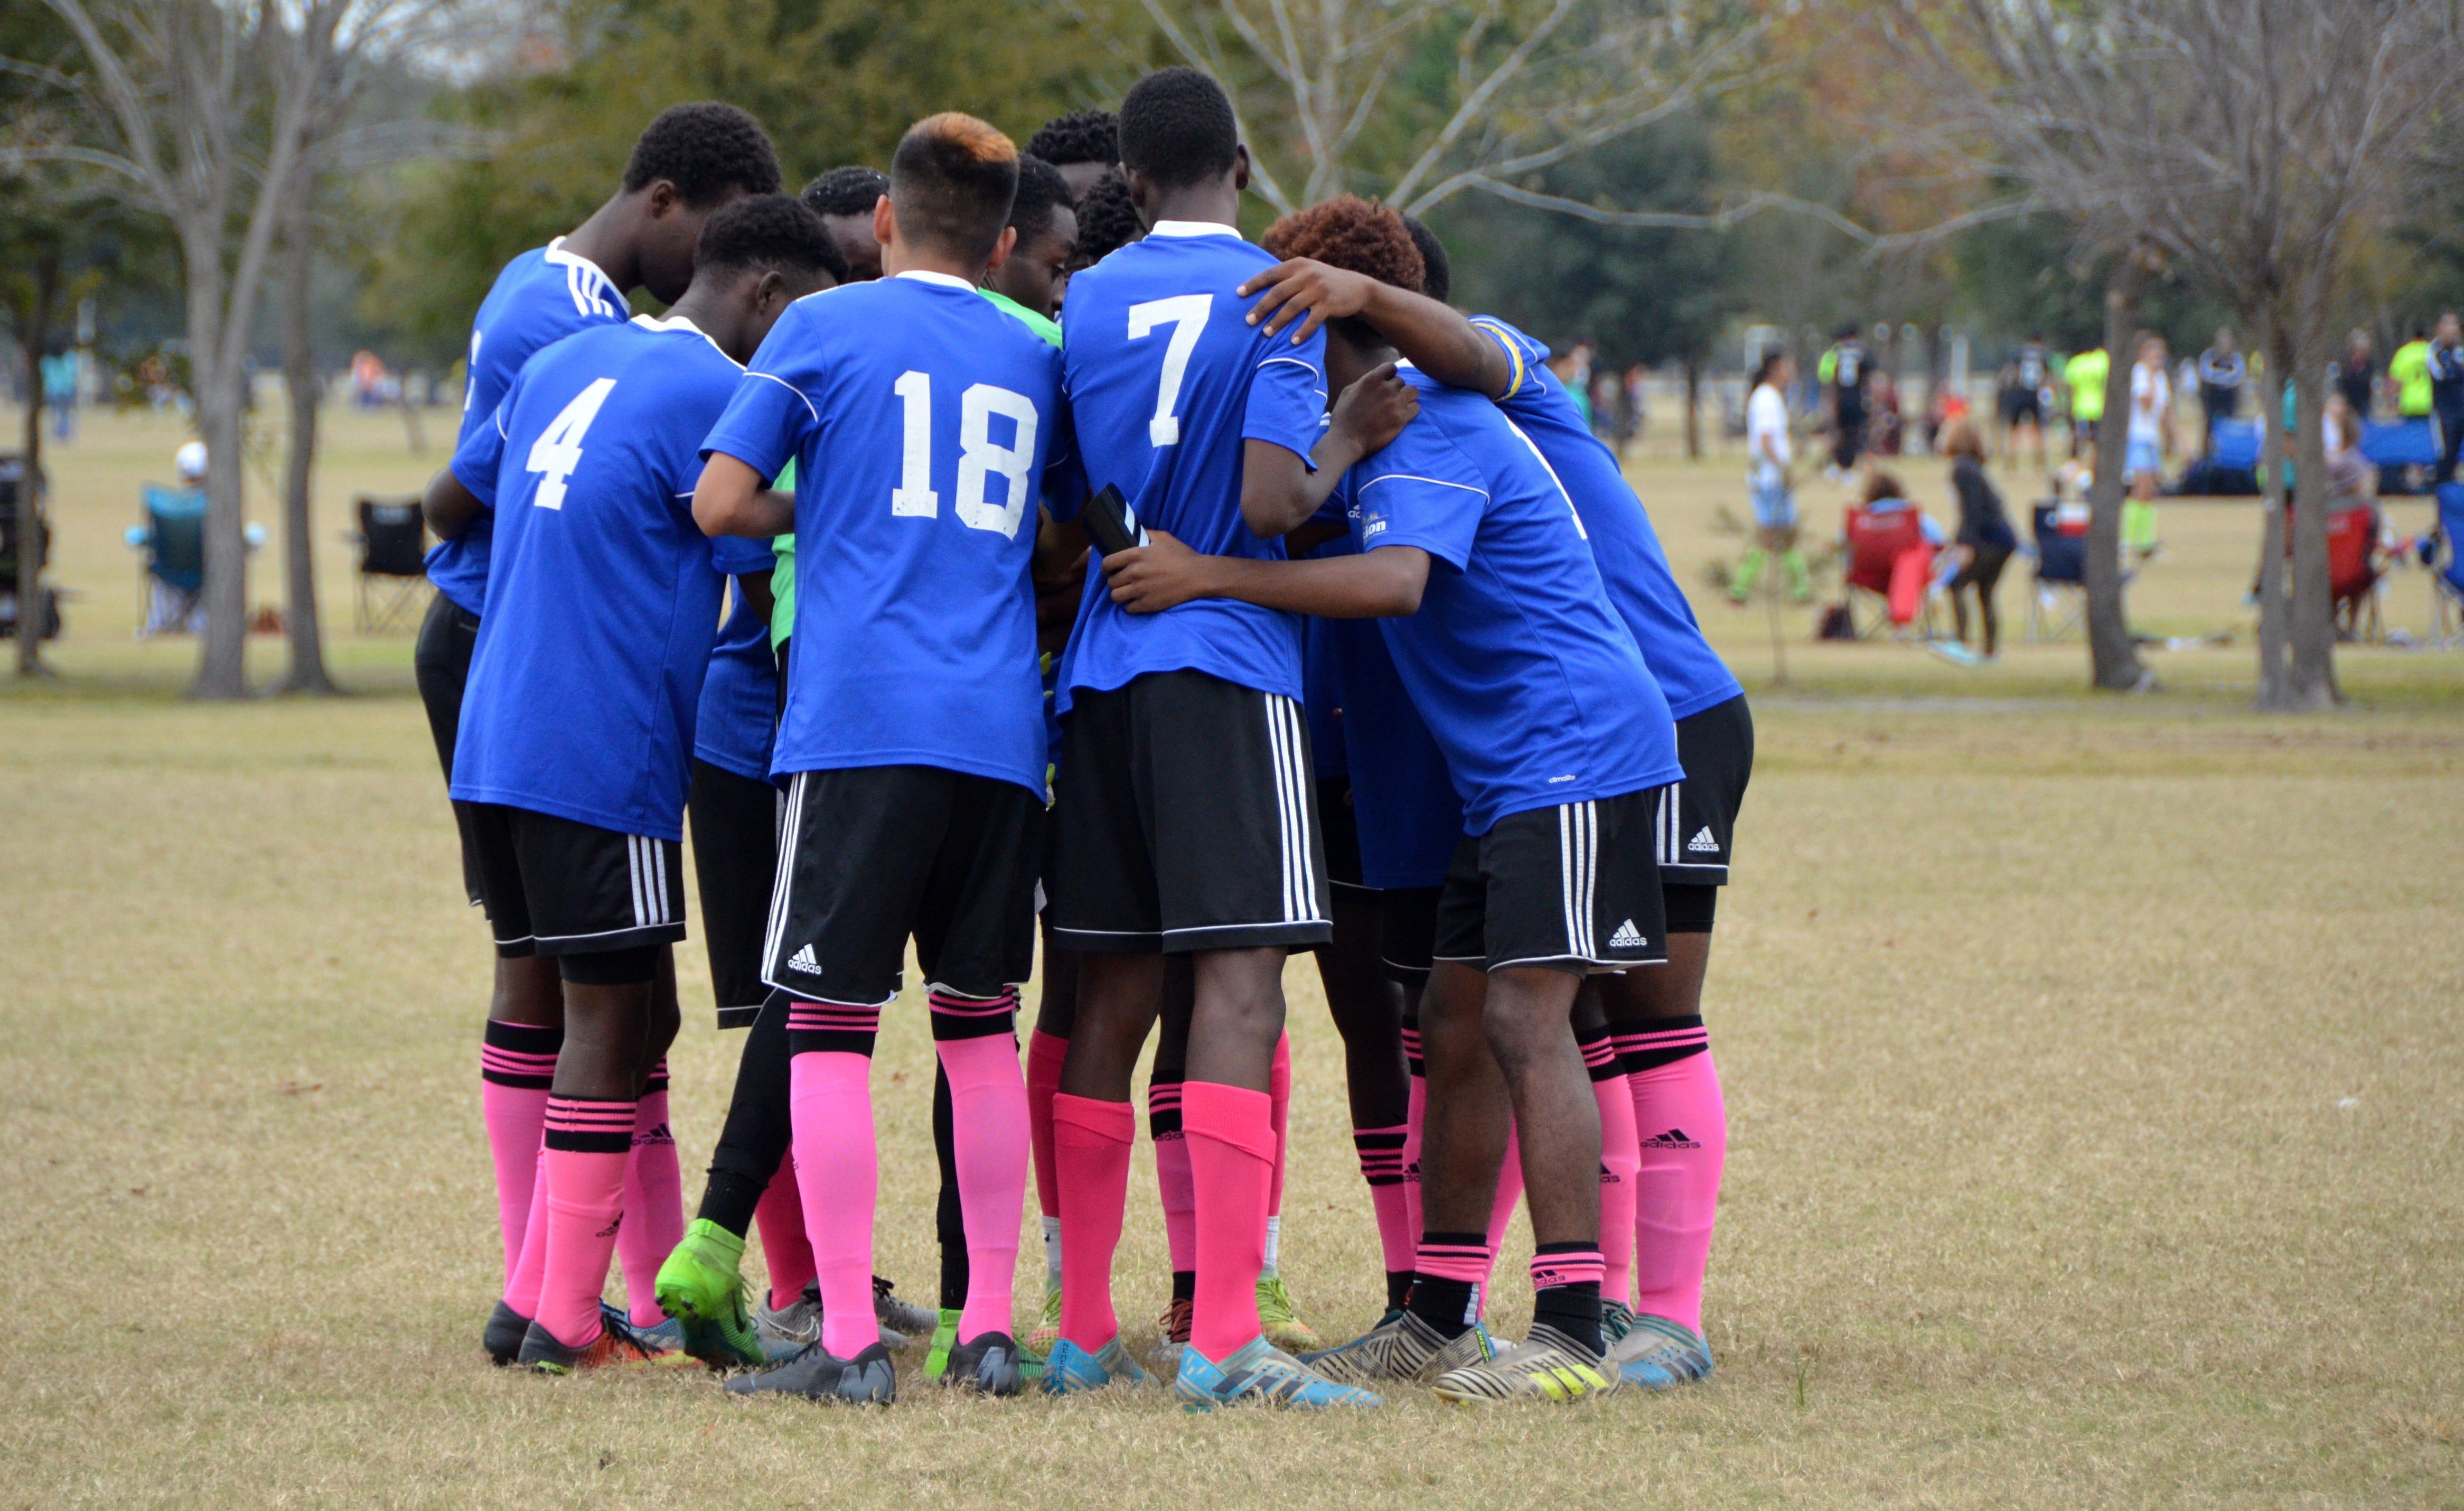 As U.S. cuts refugee numbers, African teens find brotherhood on a Texas soccer team